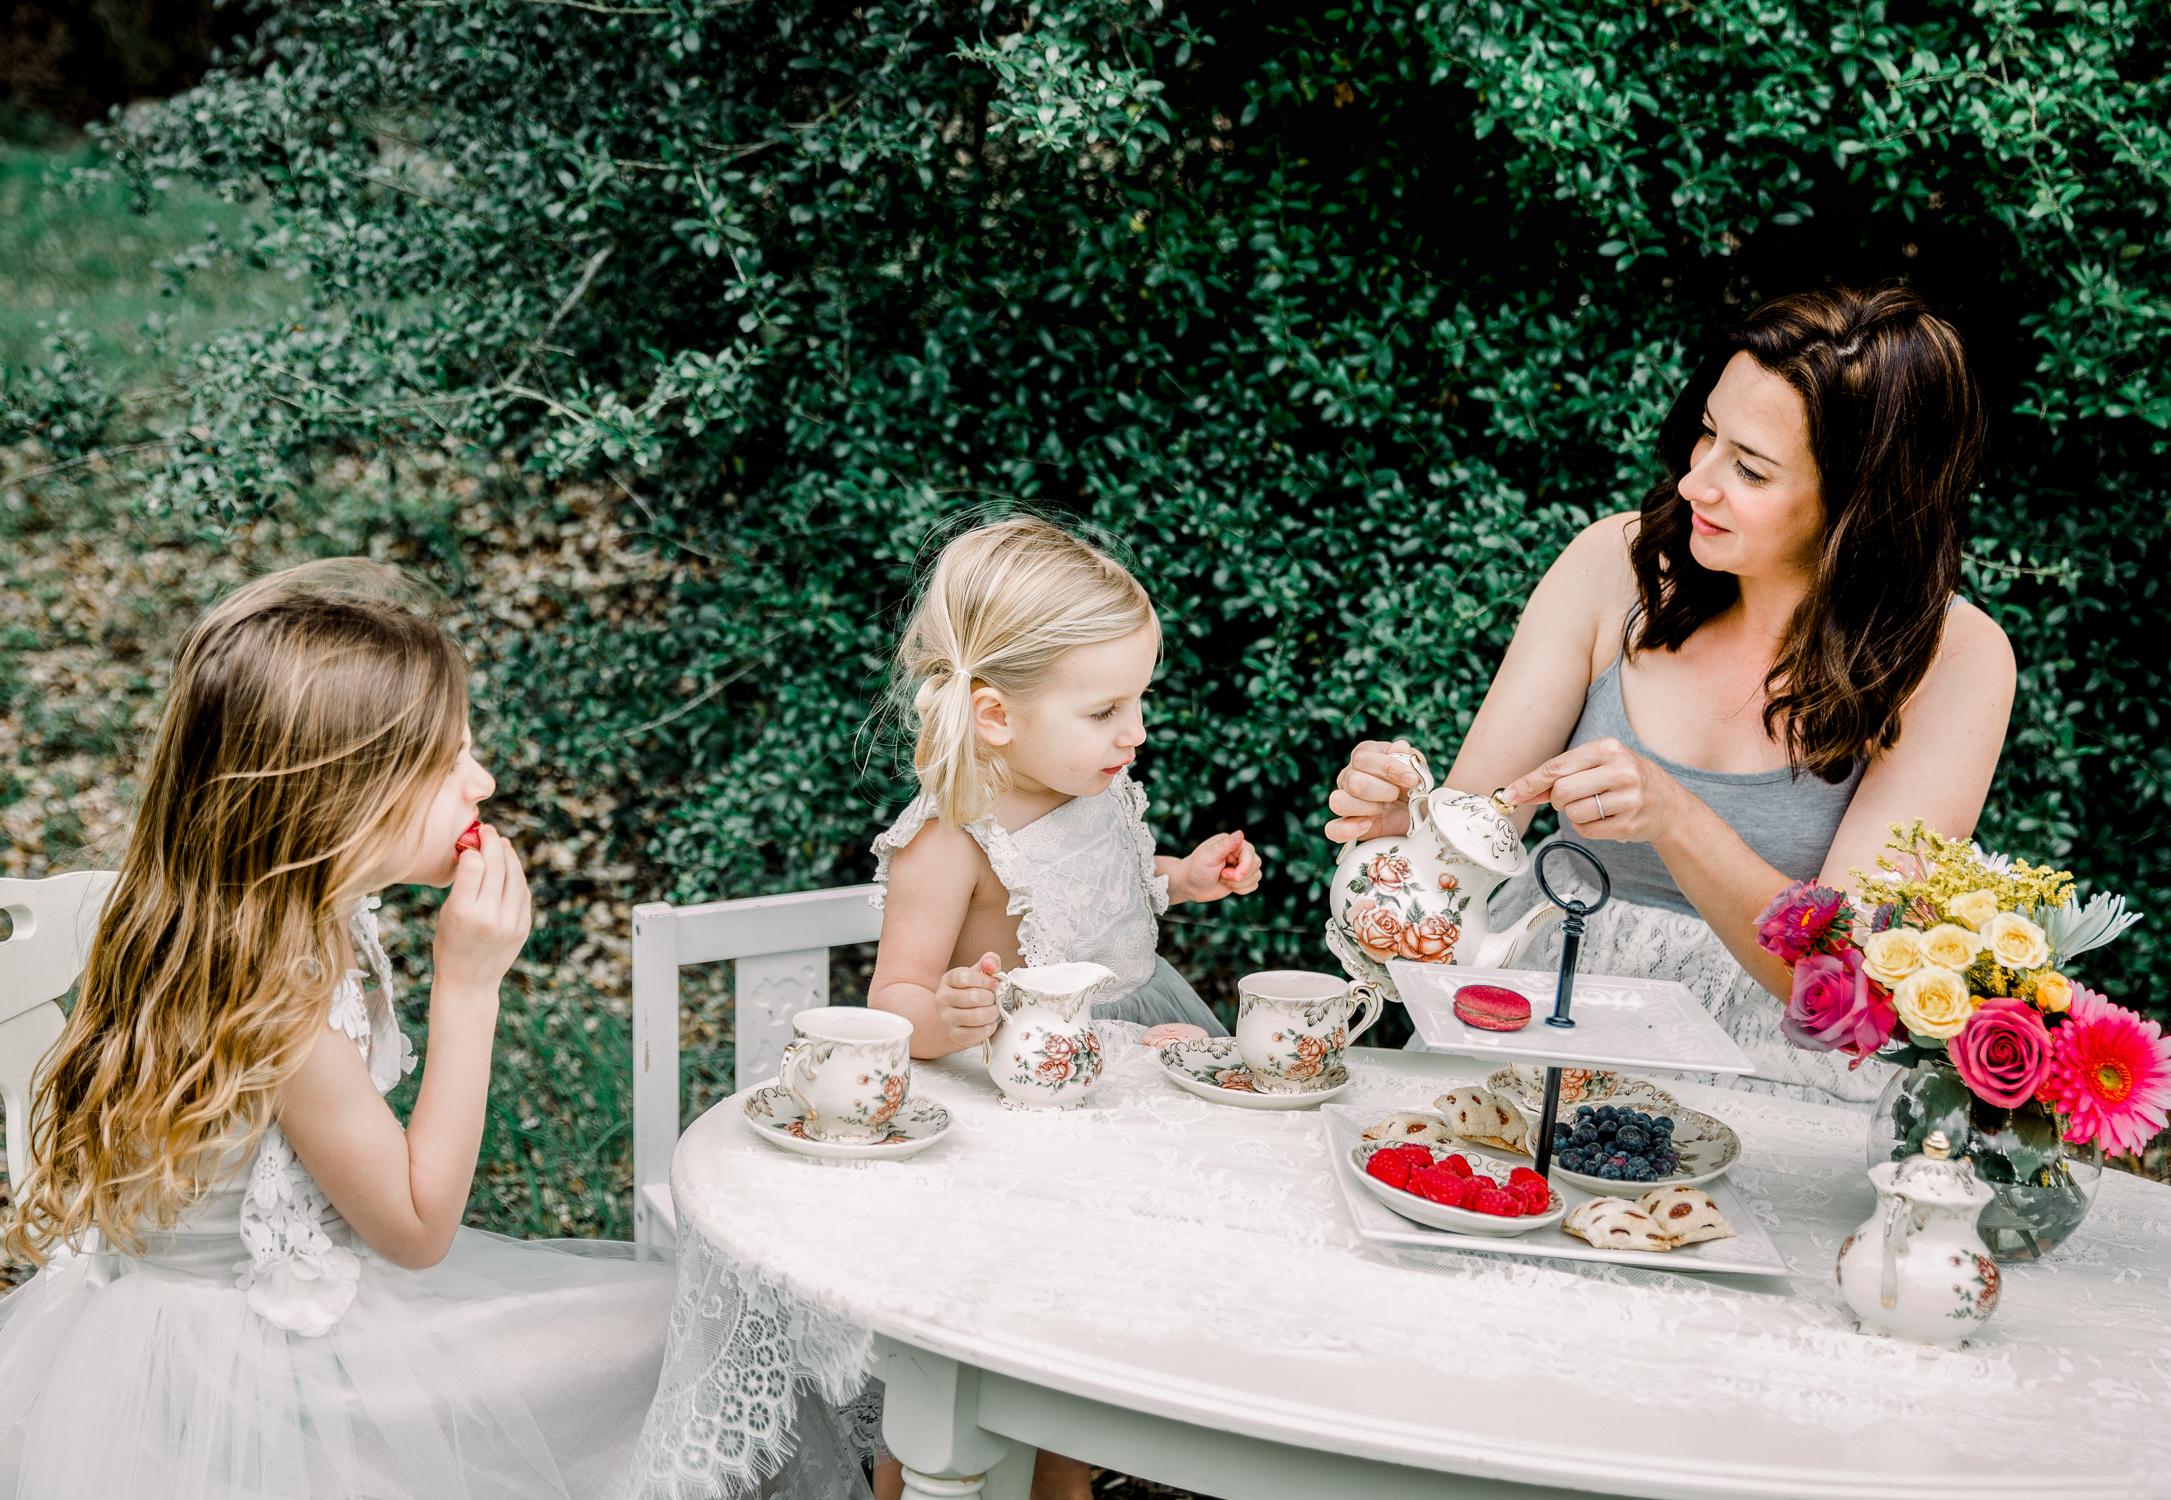 lifestyle-family-photographer-franklin-tea-time-3.jpg